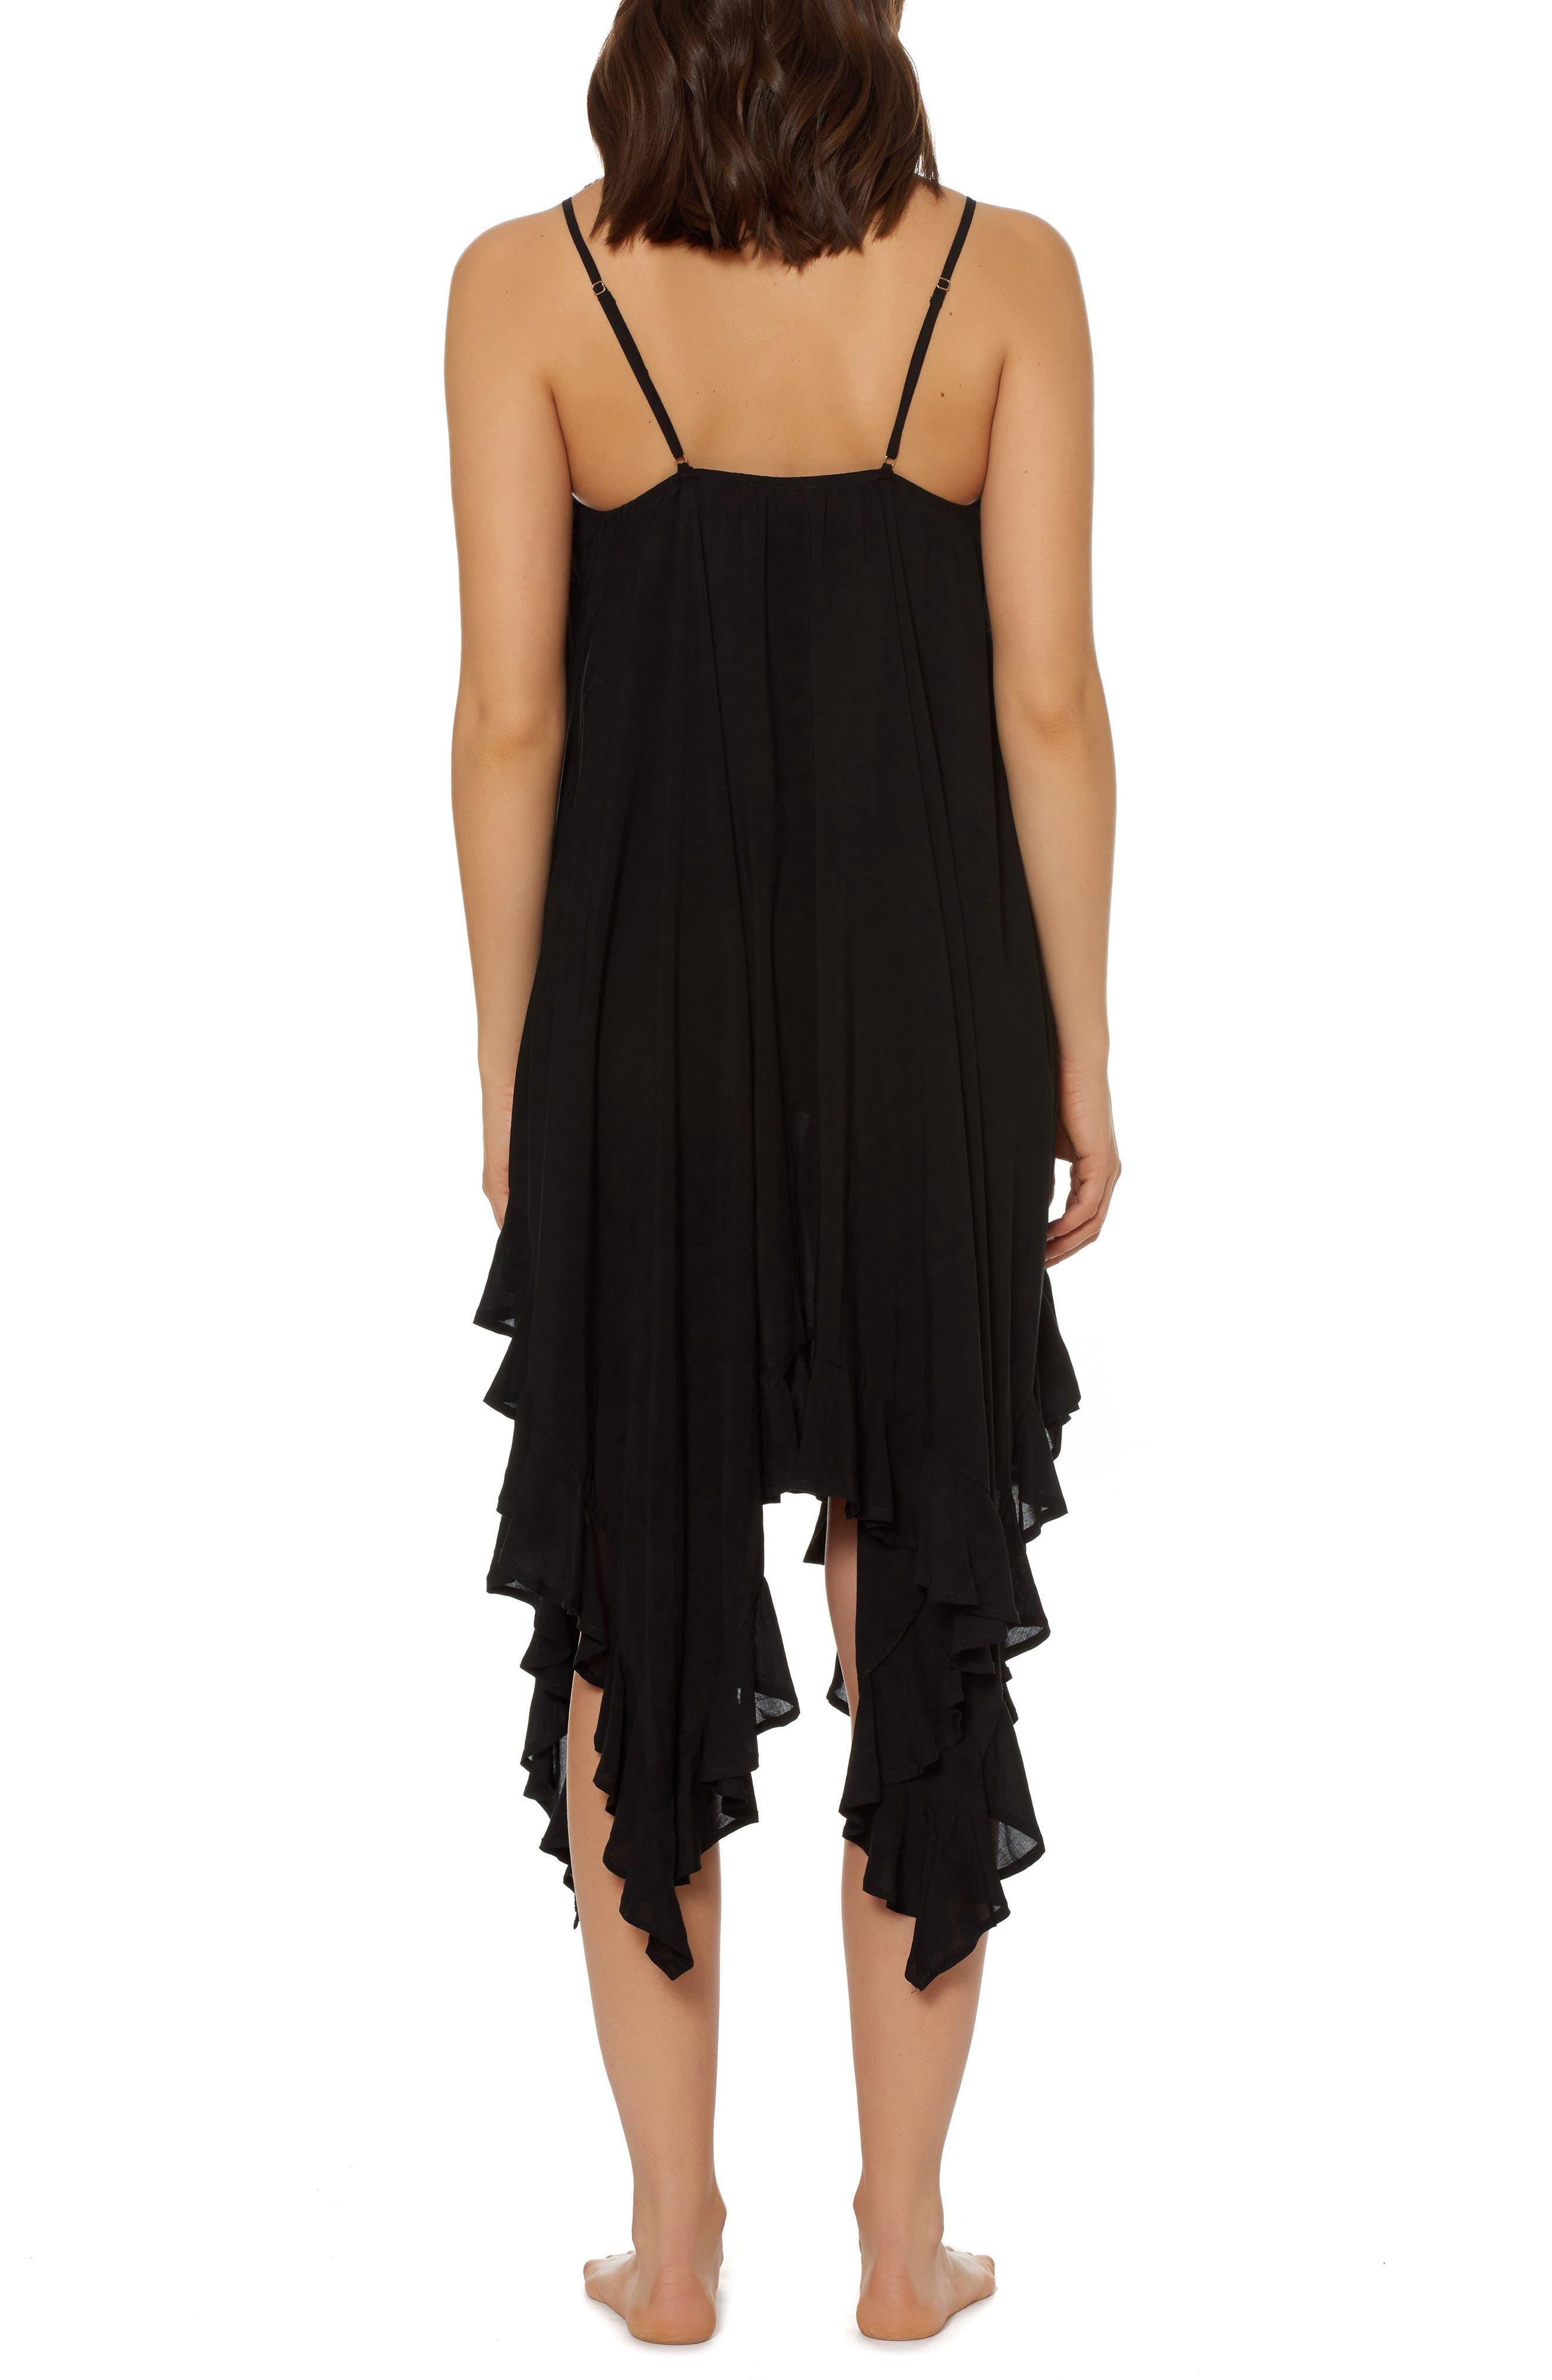 BLEU by Rod Beattie Handkerchief Hem Cover-Up Dress,                             Alternate thumbnail 2, color,                             001